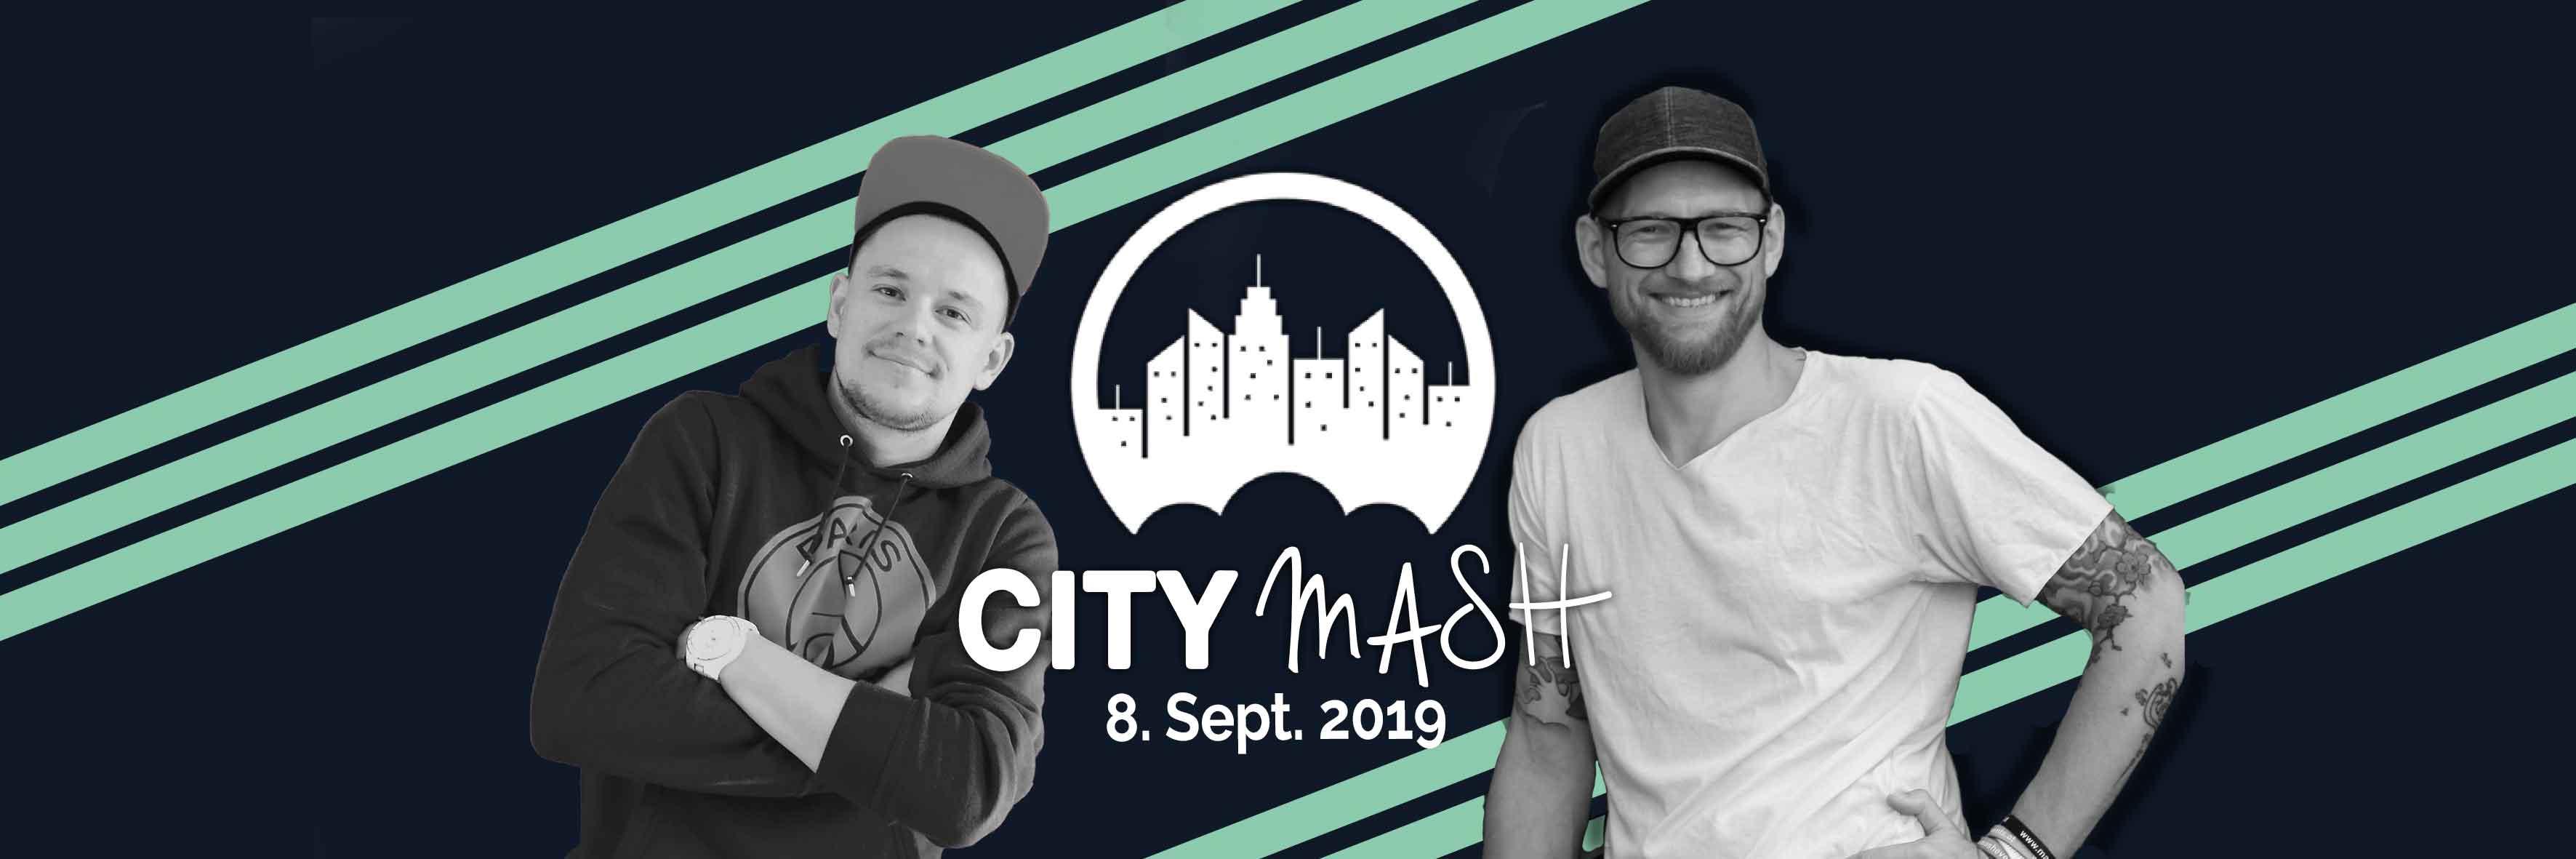 citymash8.9.19